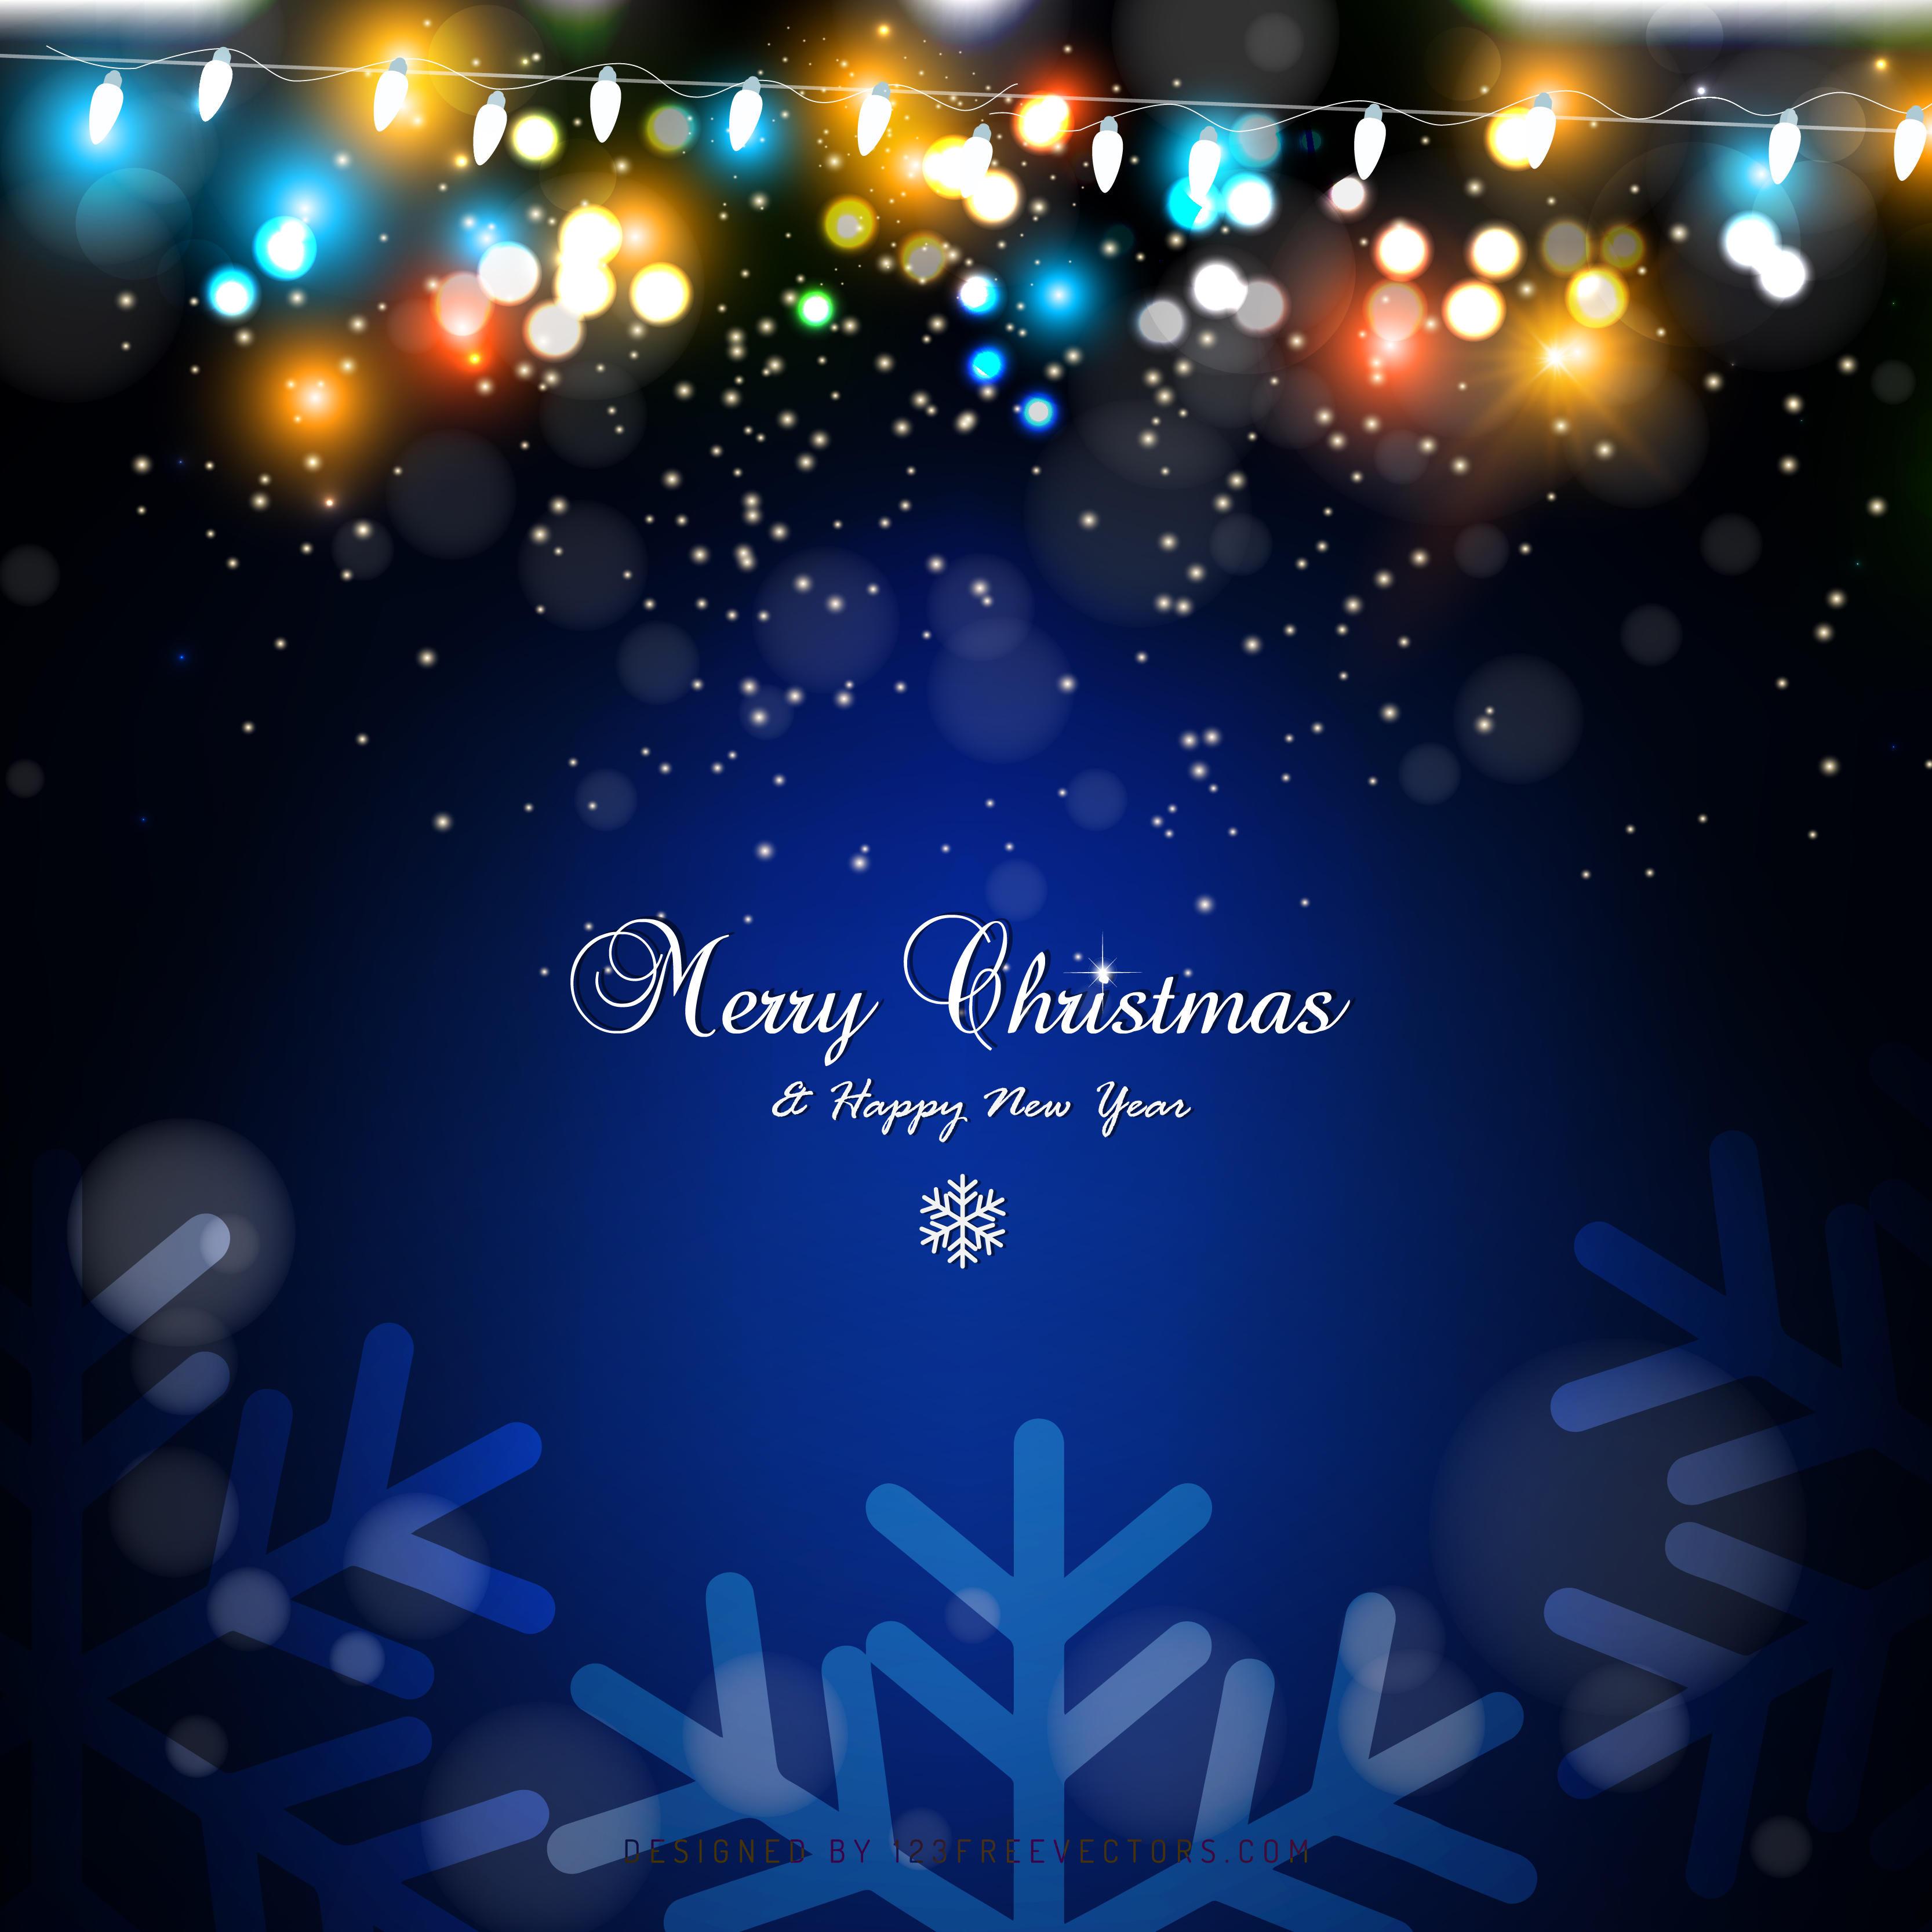 blue green christmas lights background graphics 123freevectors - Blue And Green Christmas Lights